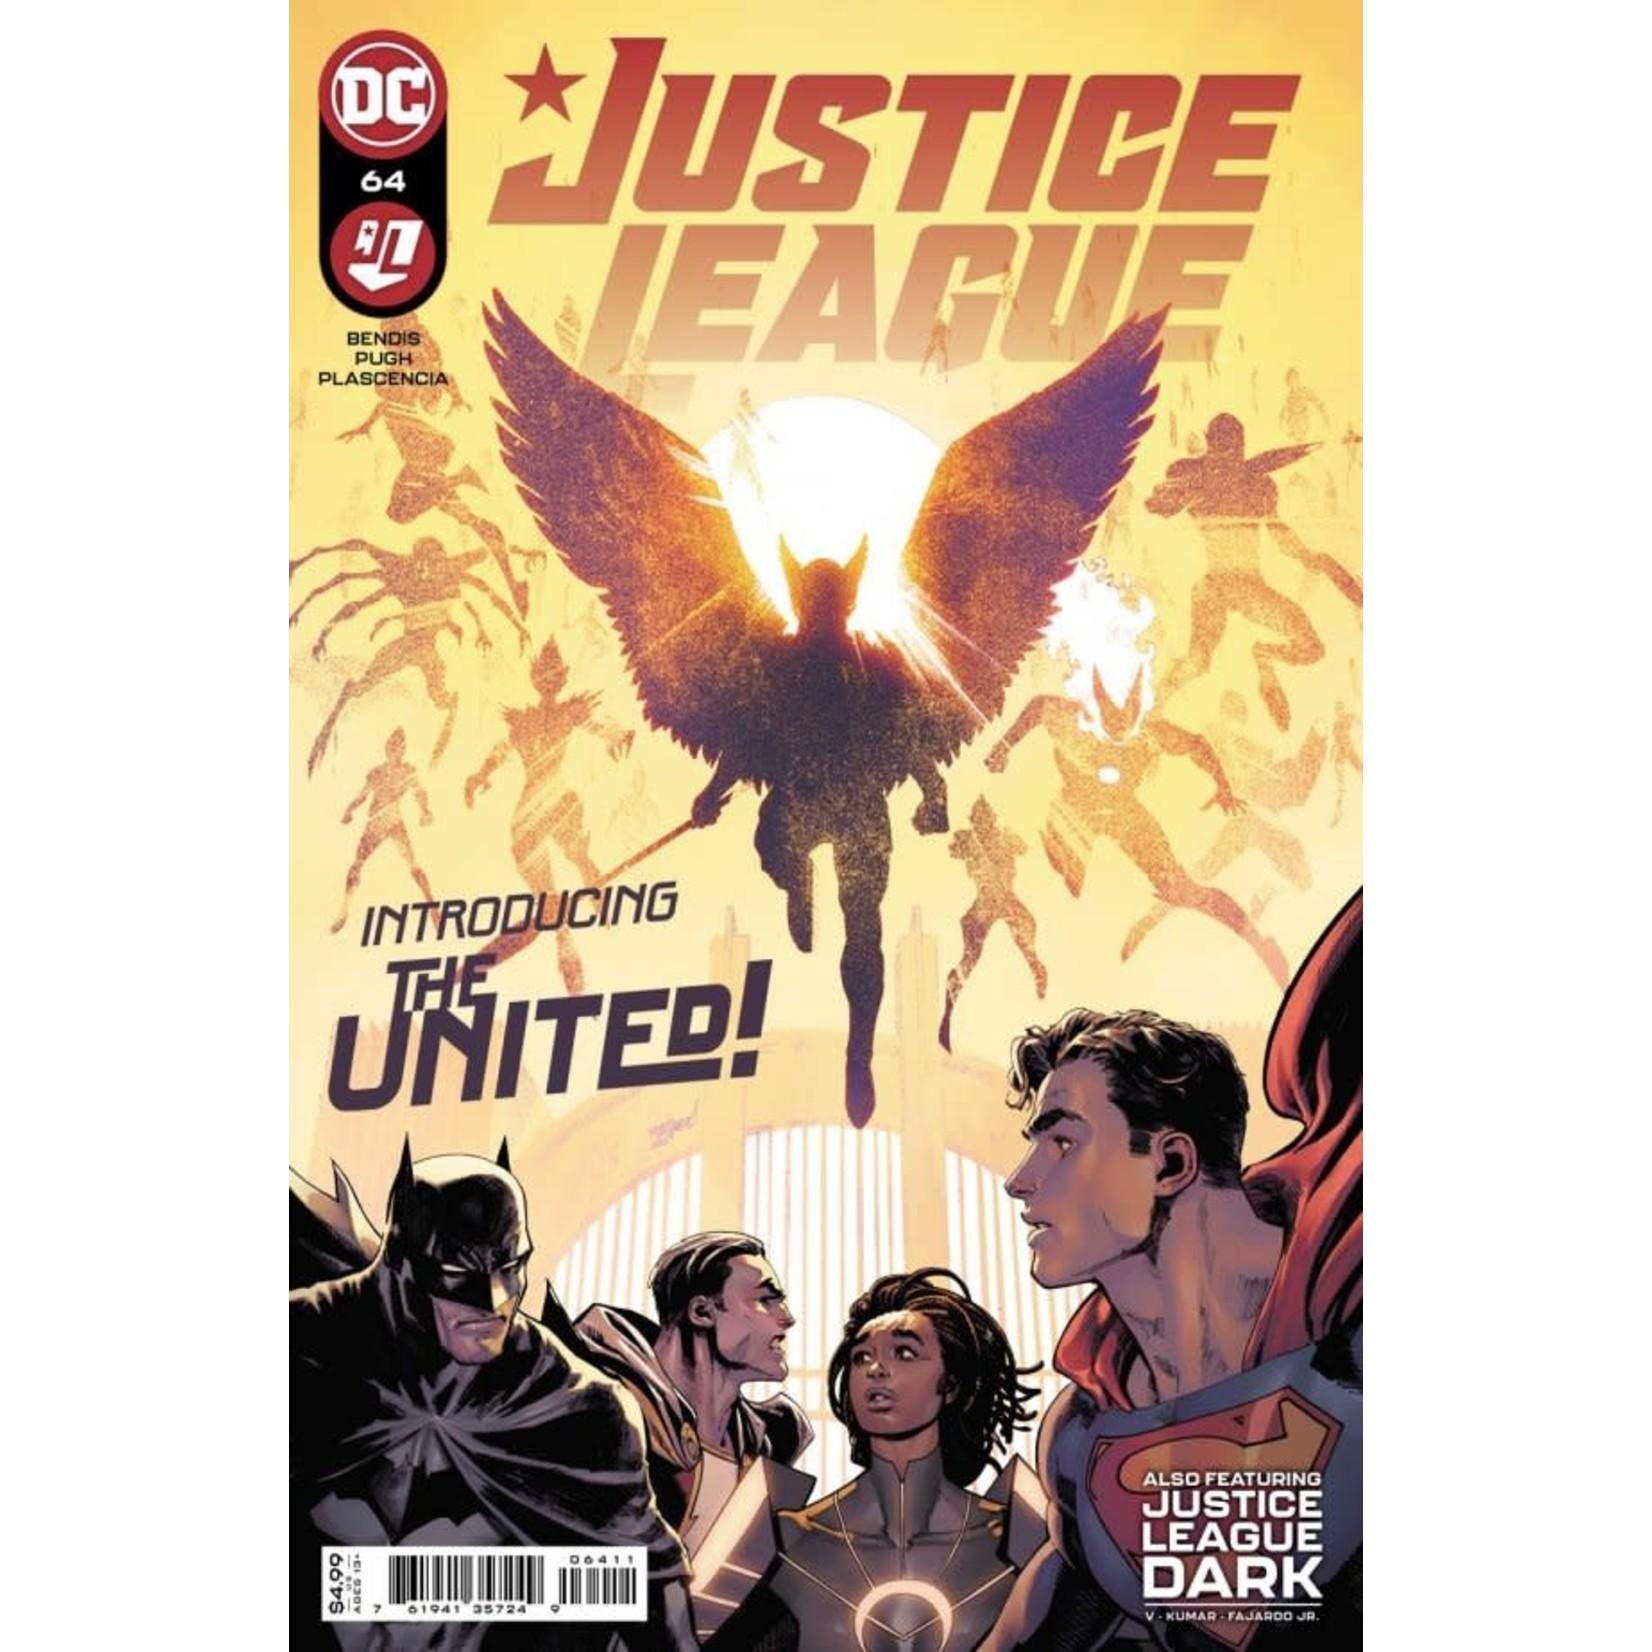 DC Comics Justice League #64